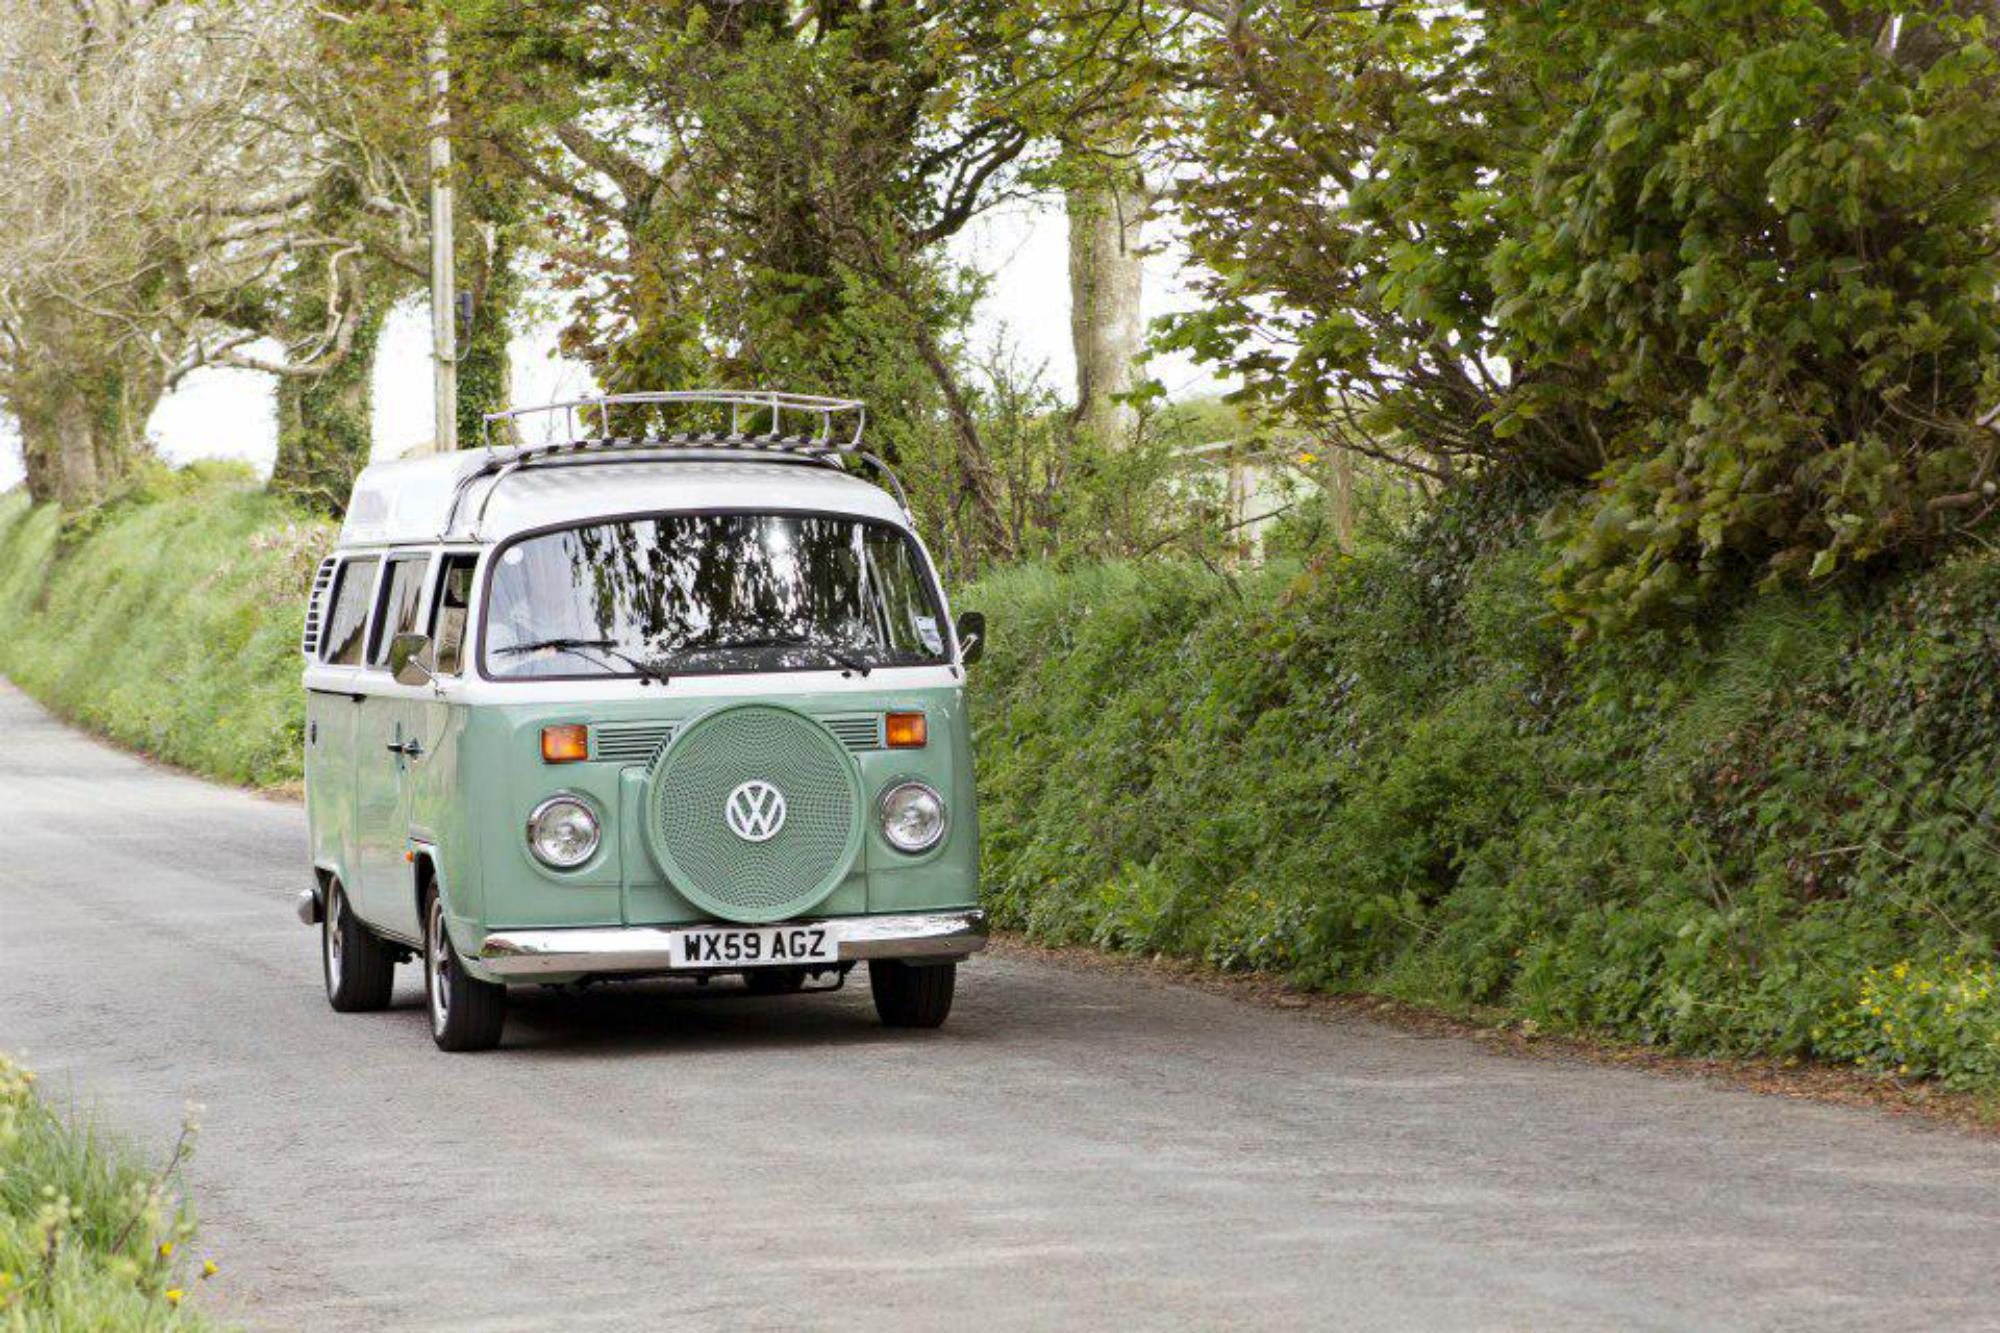 Campervan Hire in Pembrokeshire | Campervan Rental Companies in Pembrokeshire